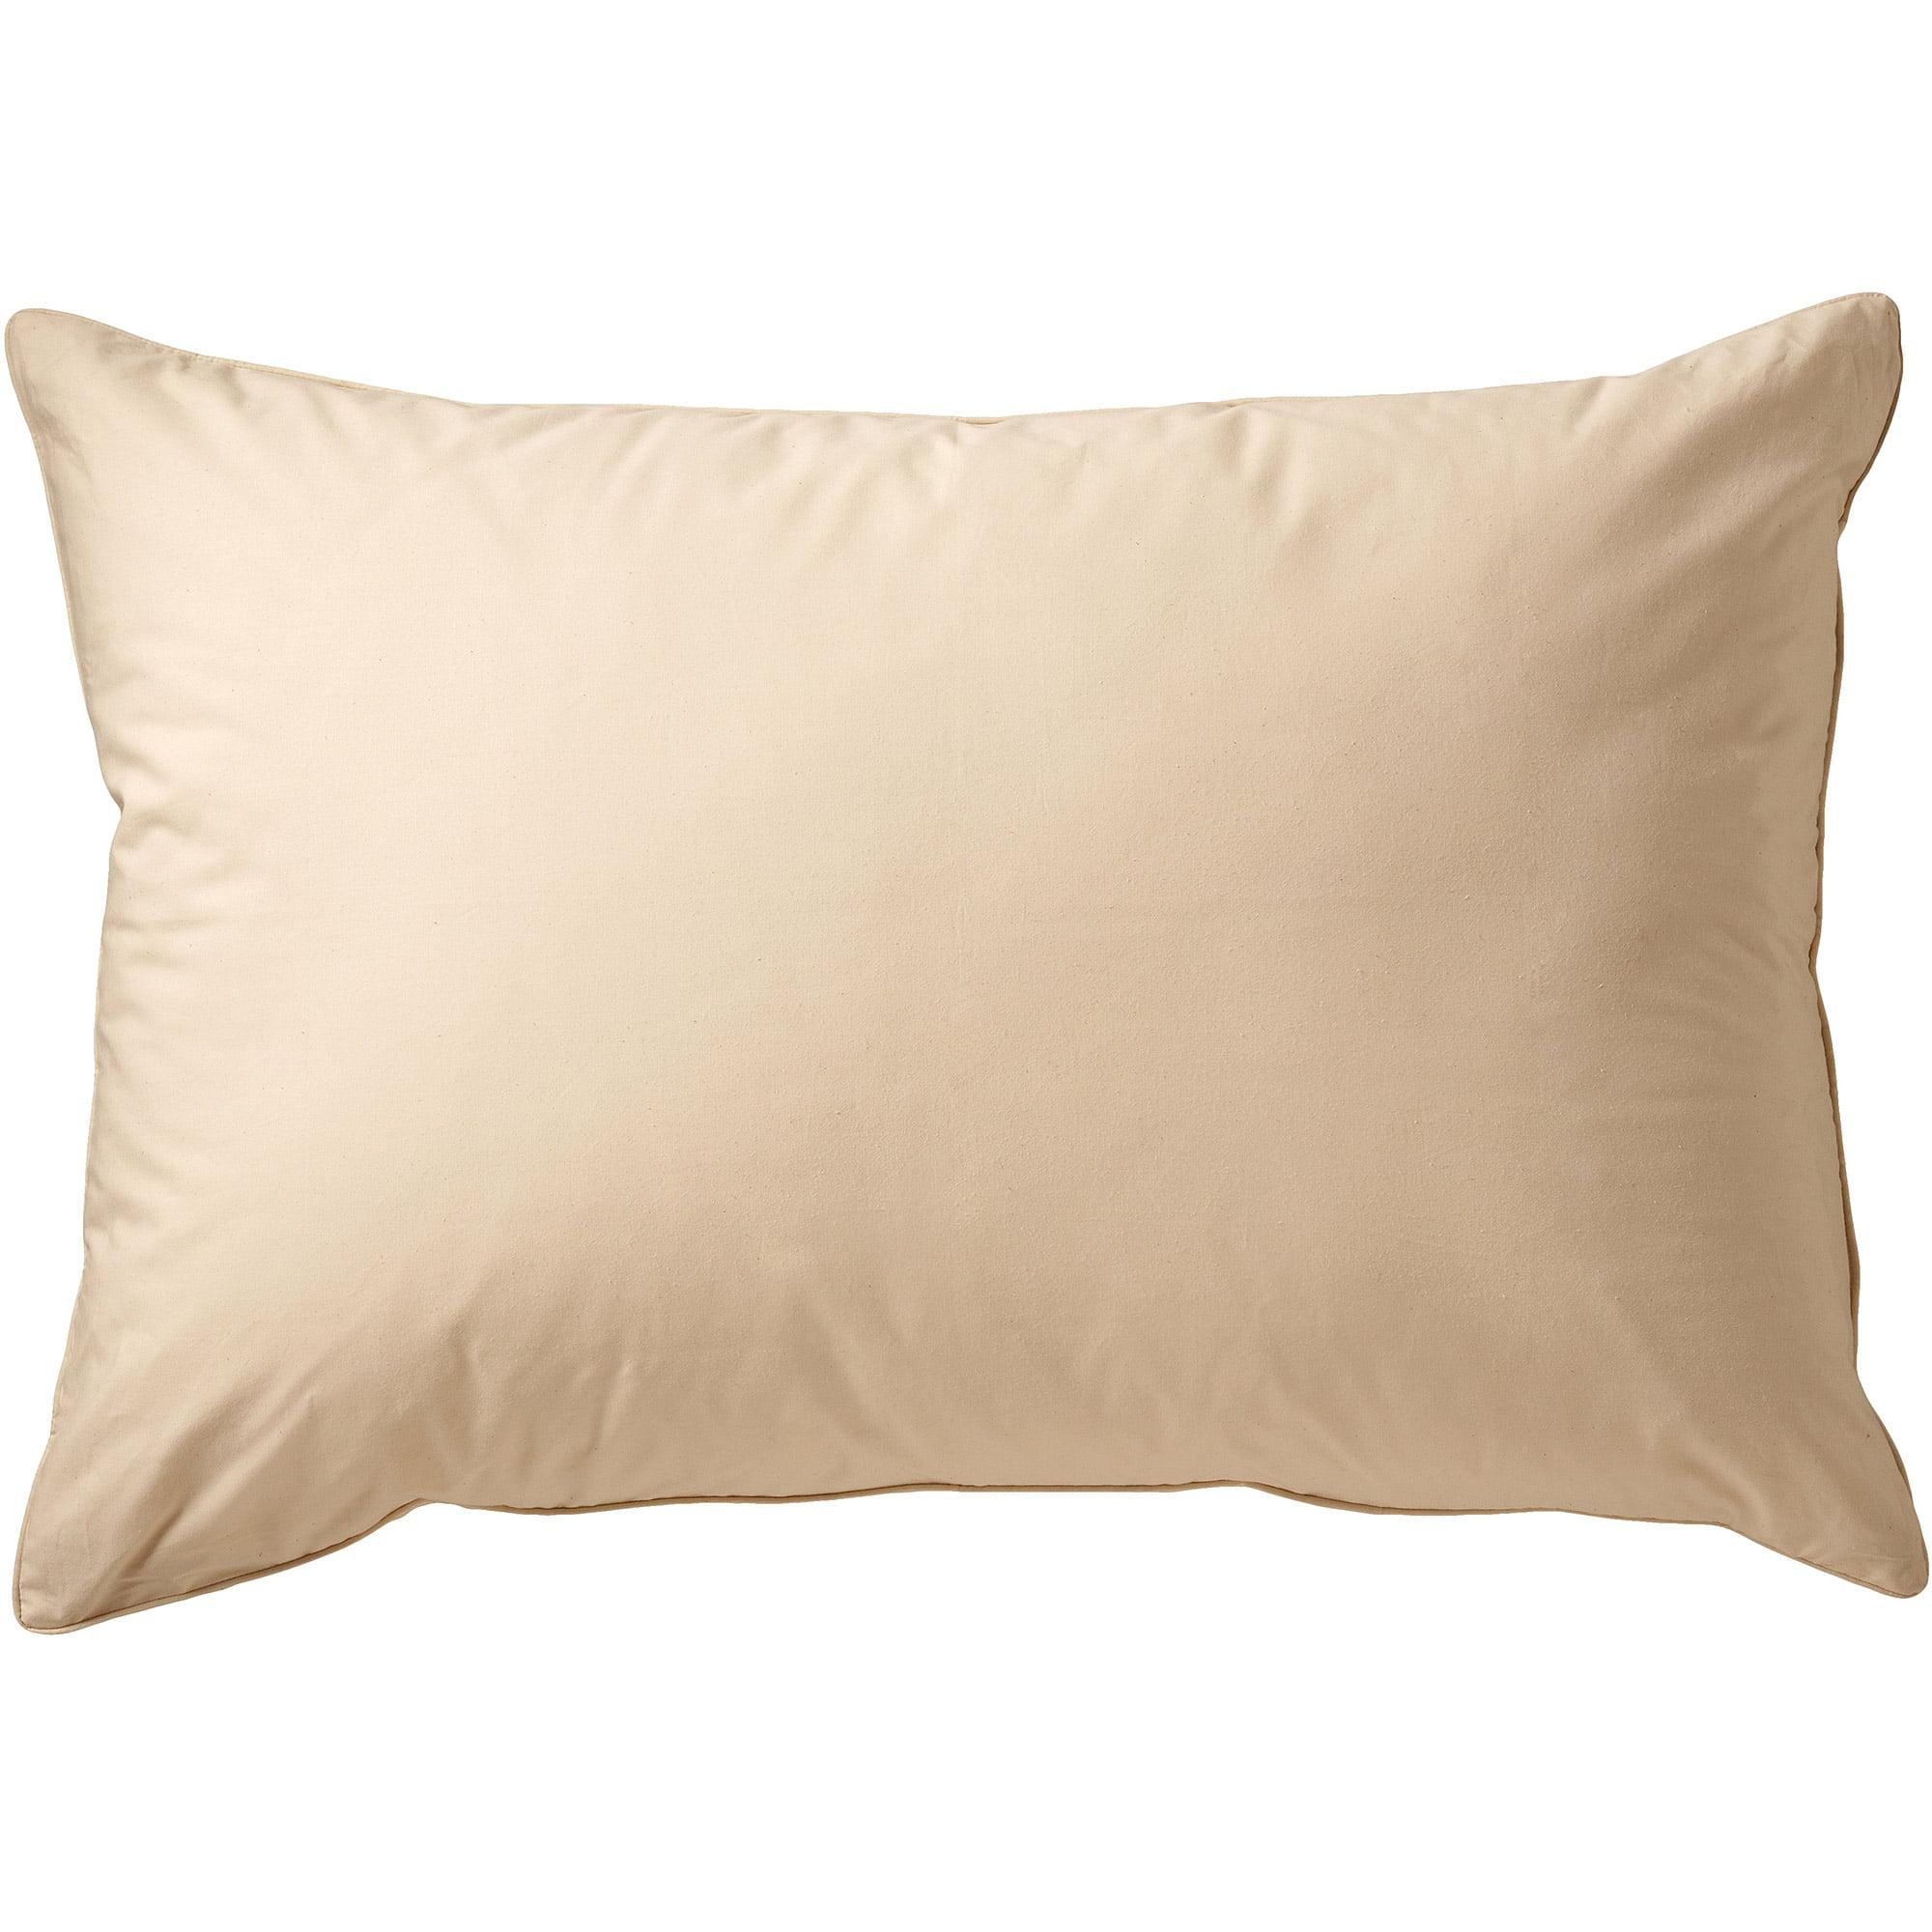 allerease organic cotton cover allergy protection pillow standard queen 20 x 28 walmart com